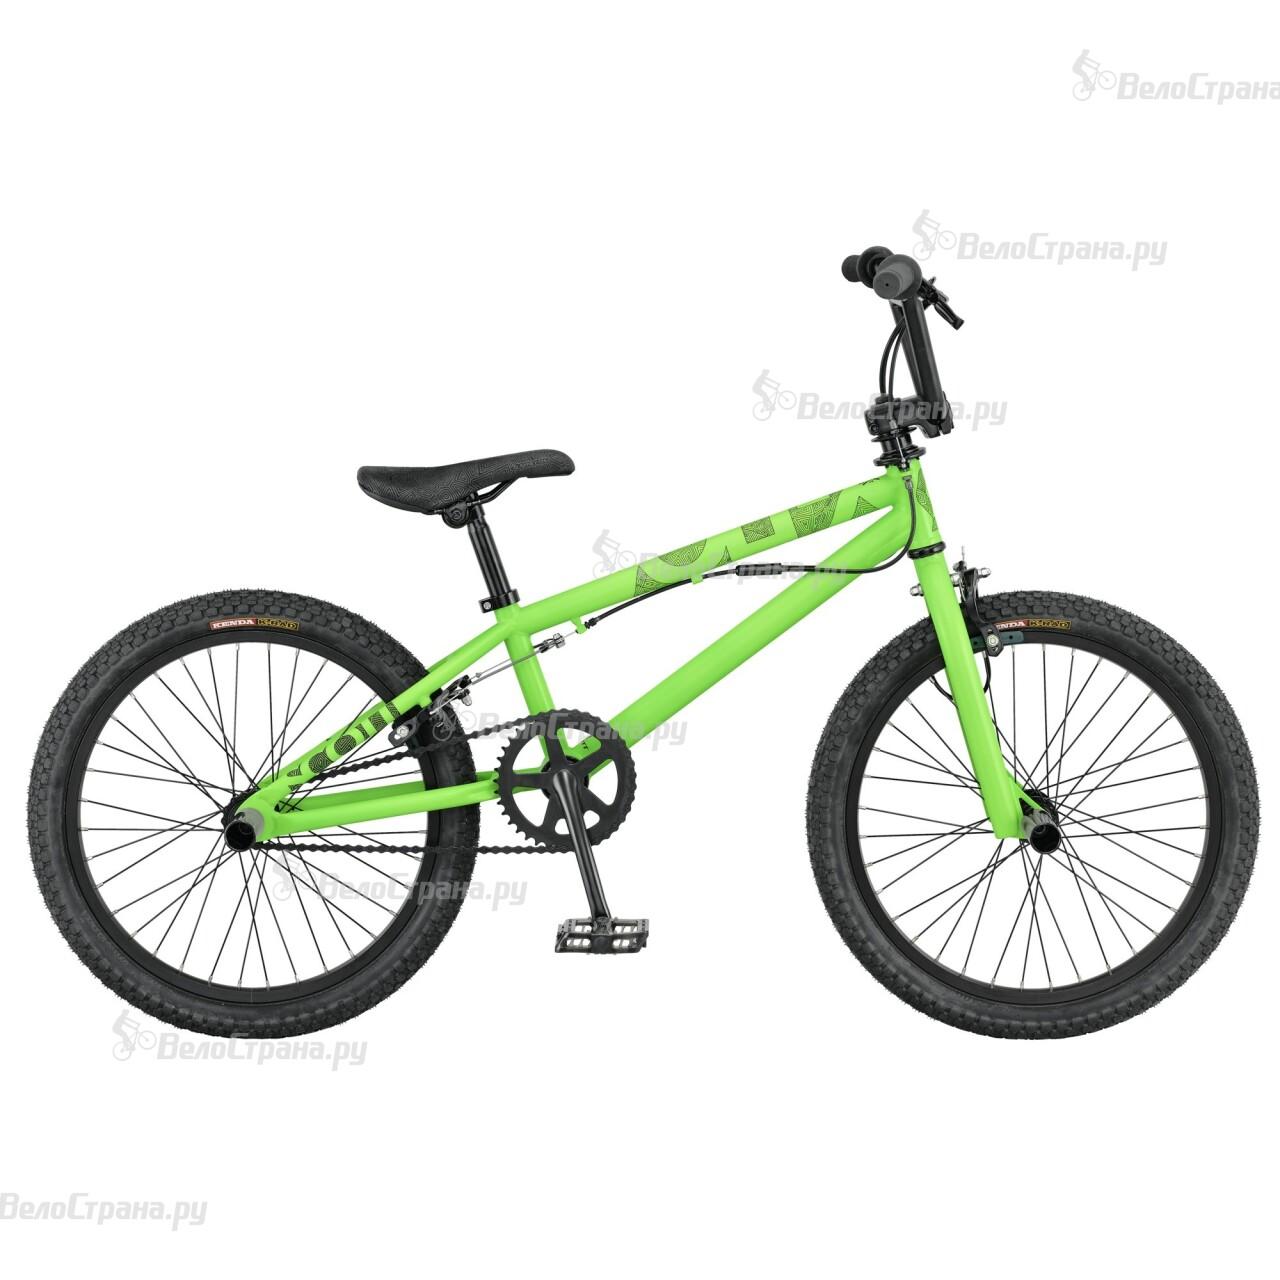 Велосипед Scott Volt-X 30 (2016)